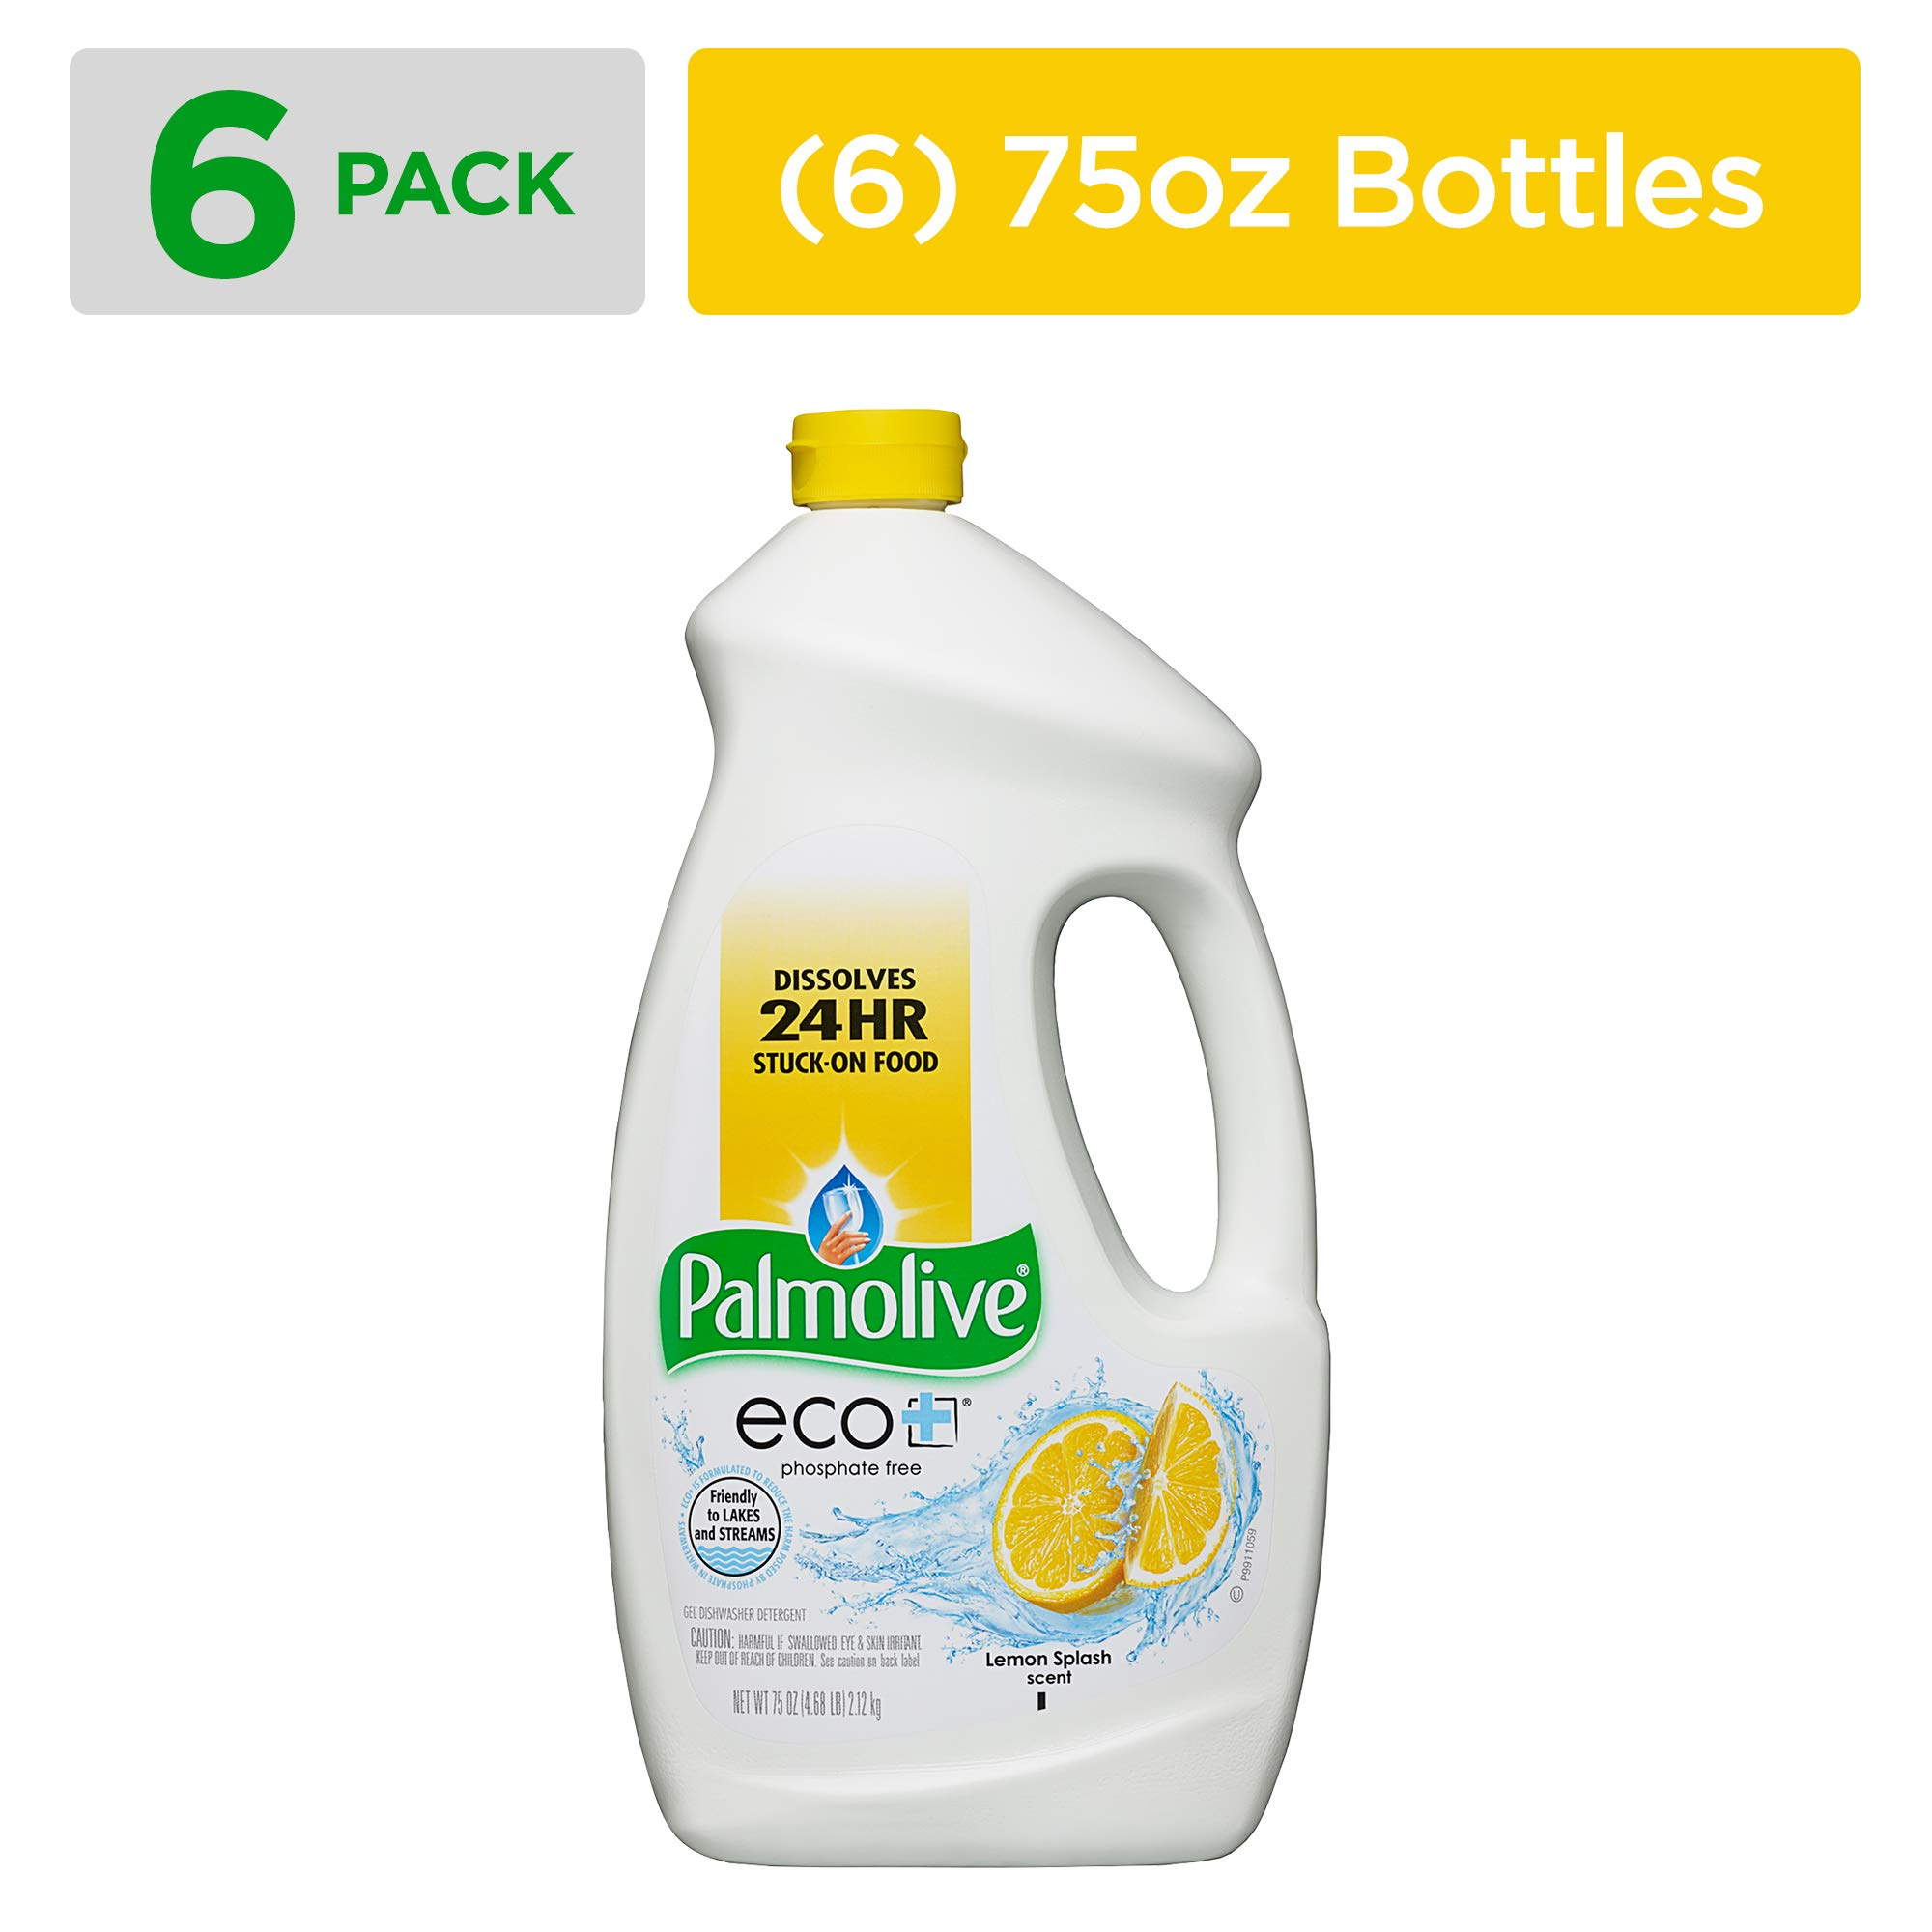 PALMOLIVE eco+ Lemon Splash Automatic Dishwashing Gel, 75 Fluid Ounce Bottle (Case of 6) (Model Number: 42706CT)